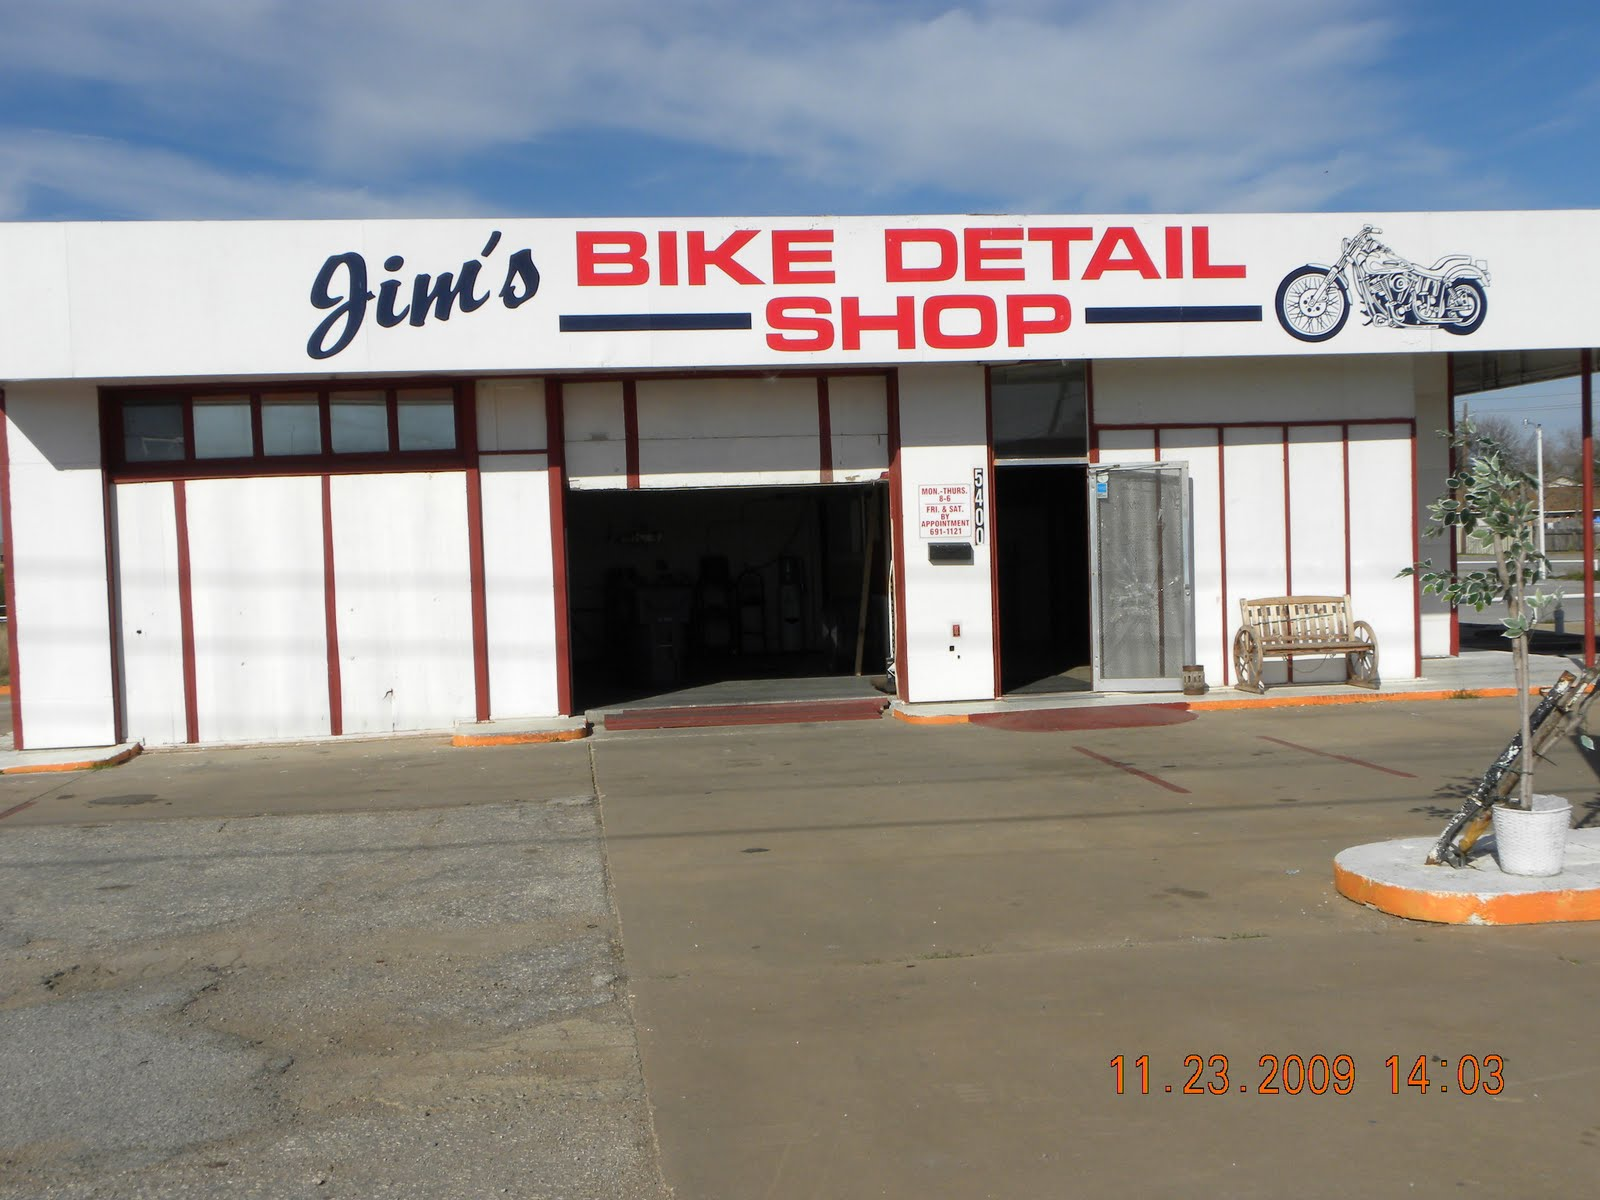 NORTH TEXAS BIKERS III  Back to Jims Bike Detail Shop 11 23 09